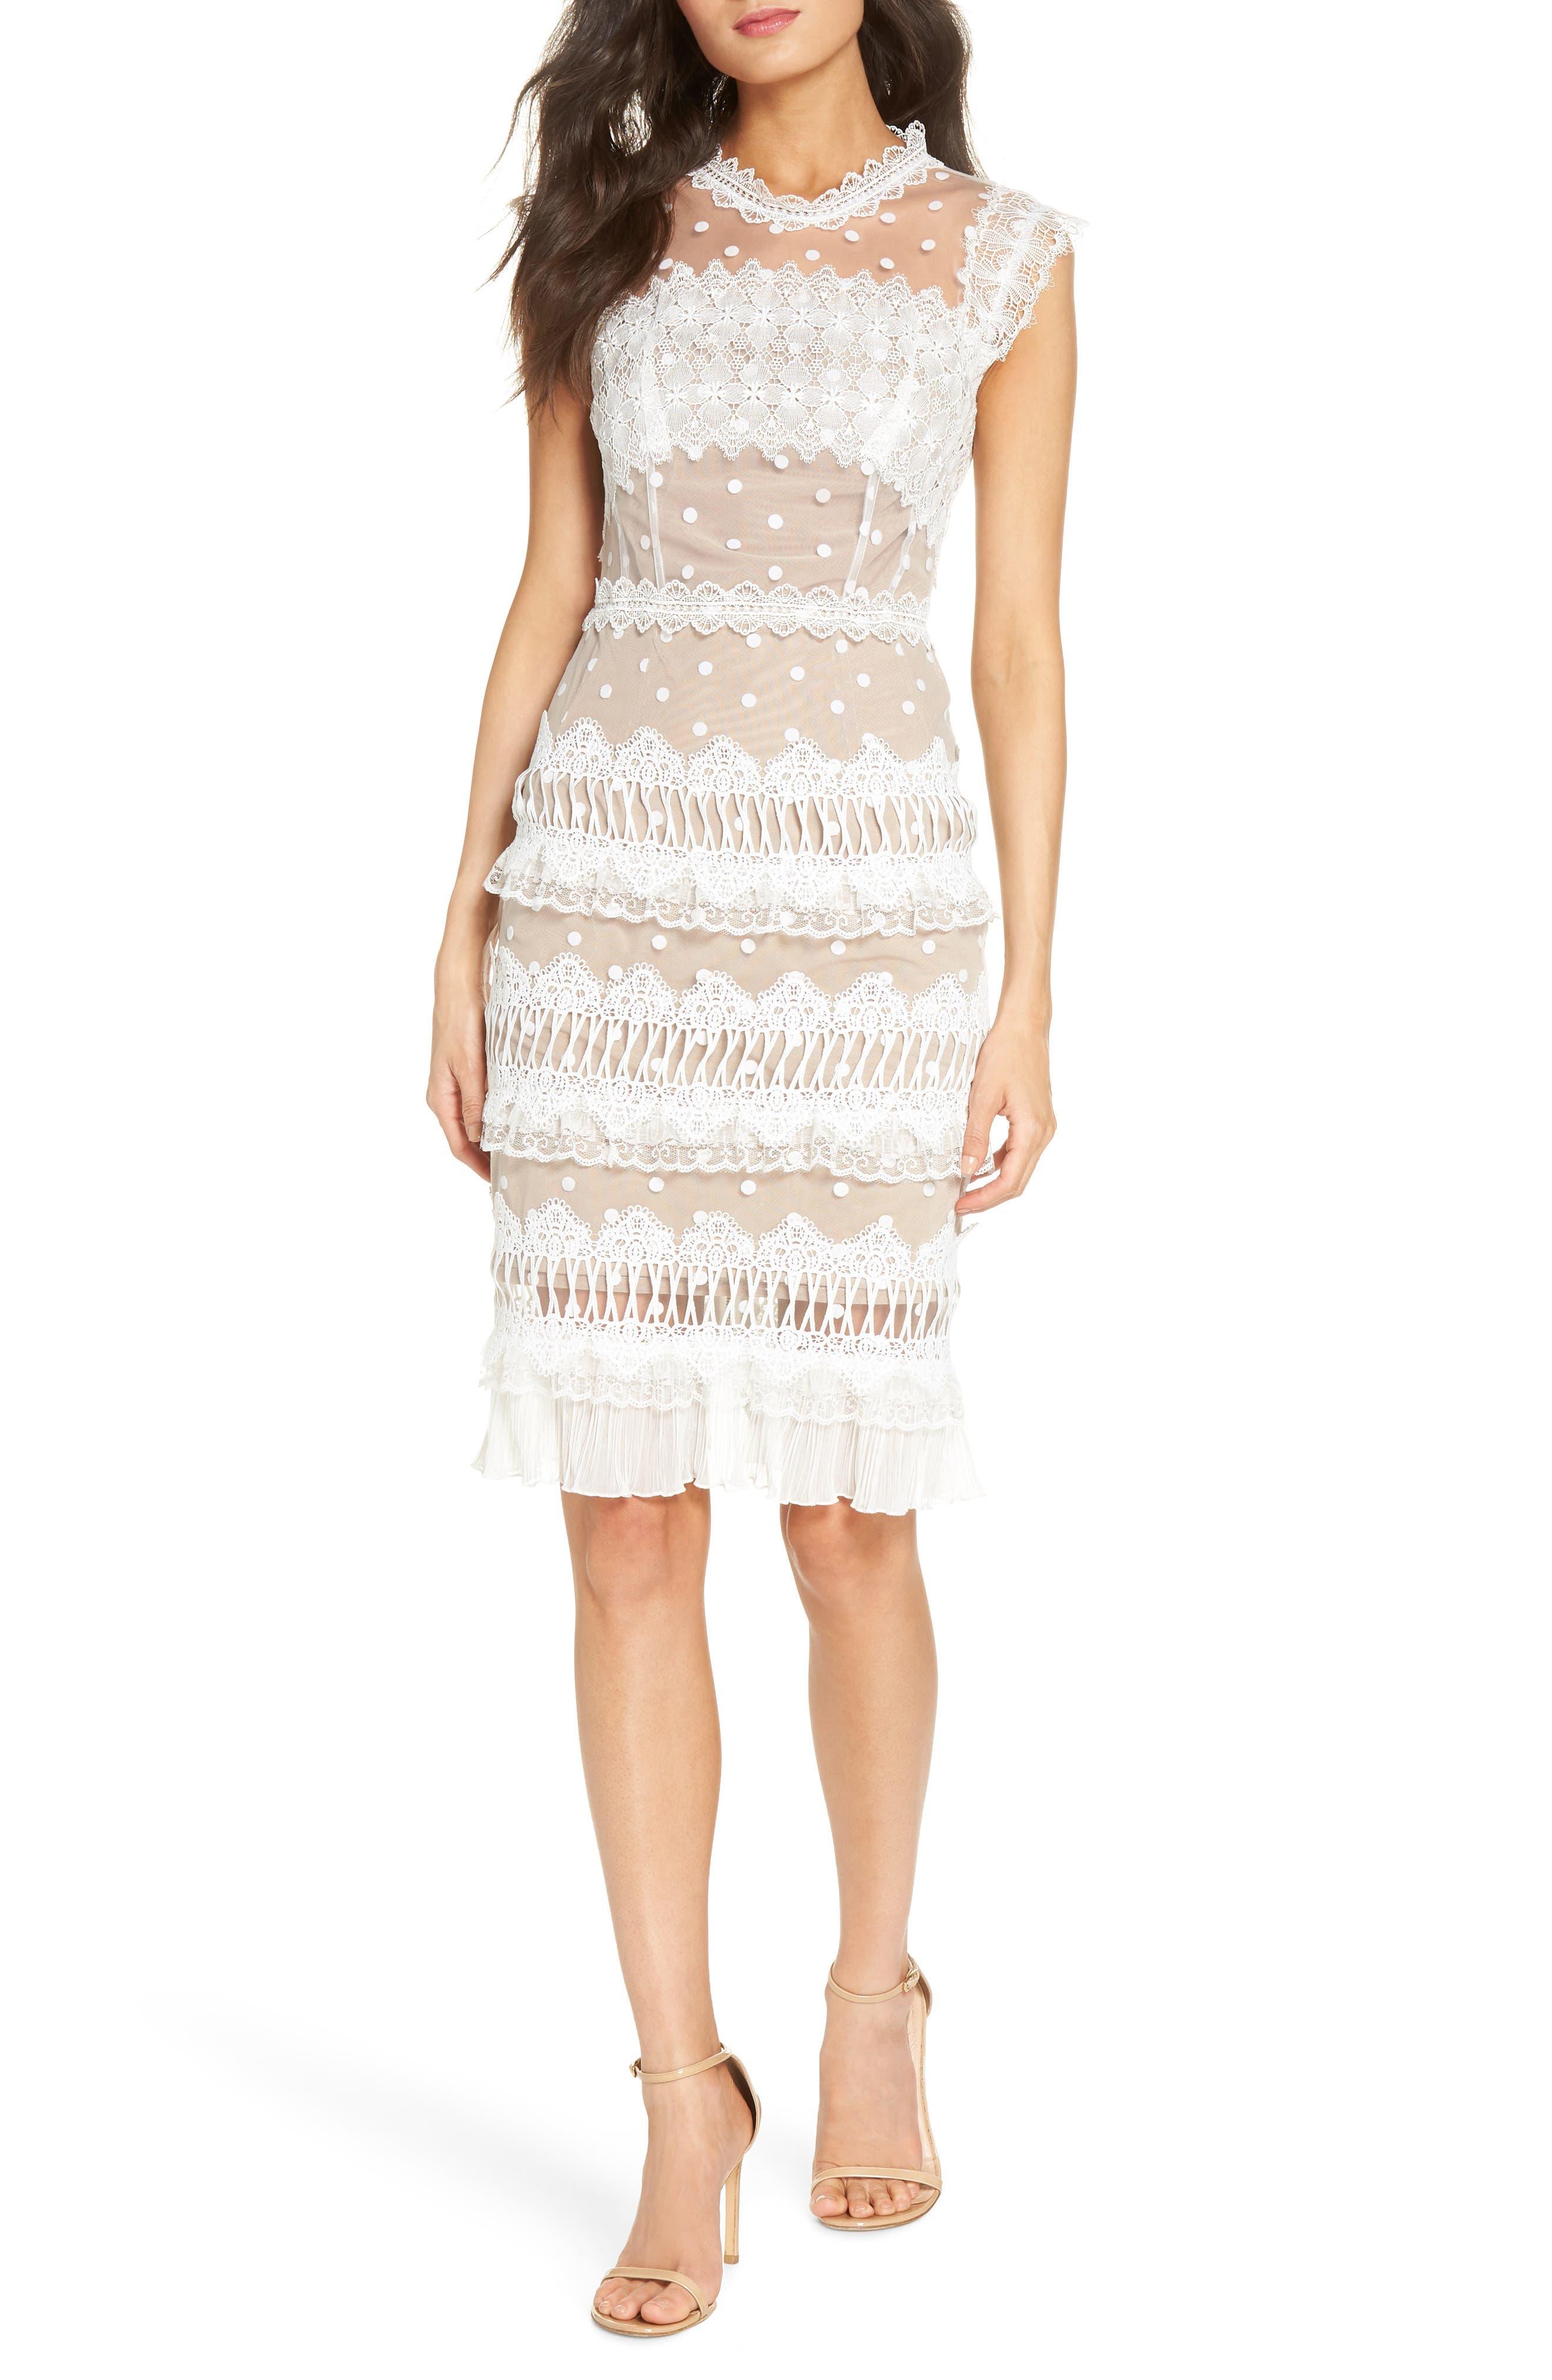 Majiorca Dot Lace Cocktail Dress,                         Main,                         color, WHITE